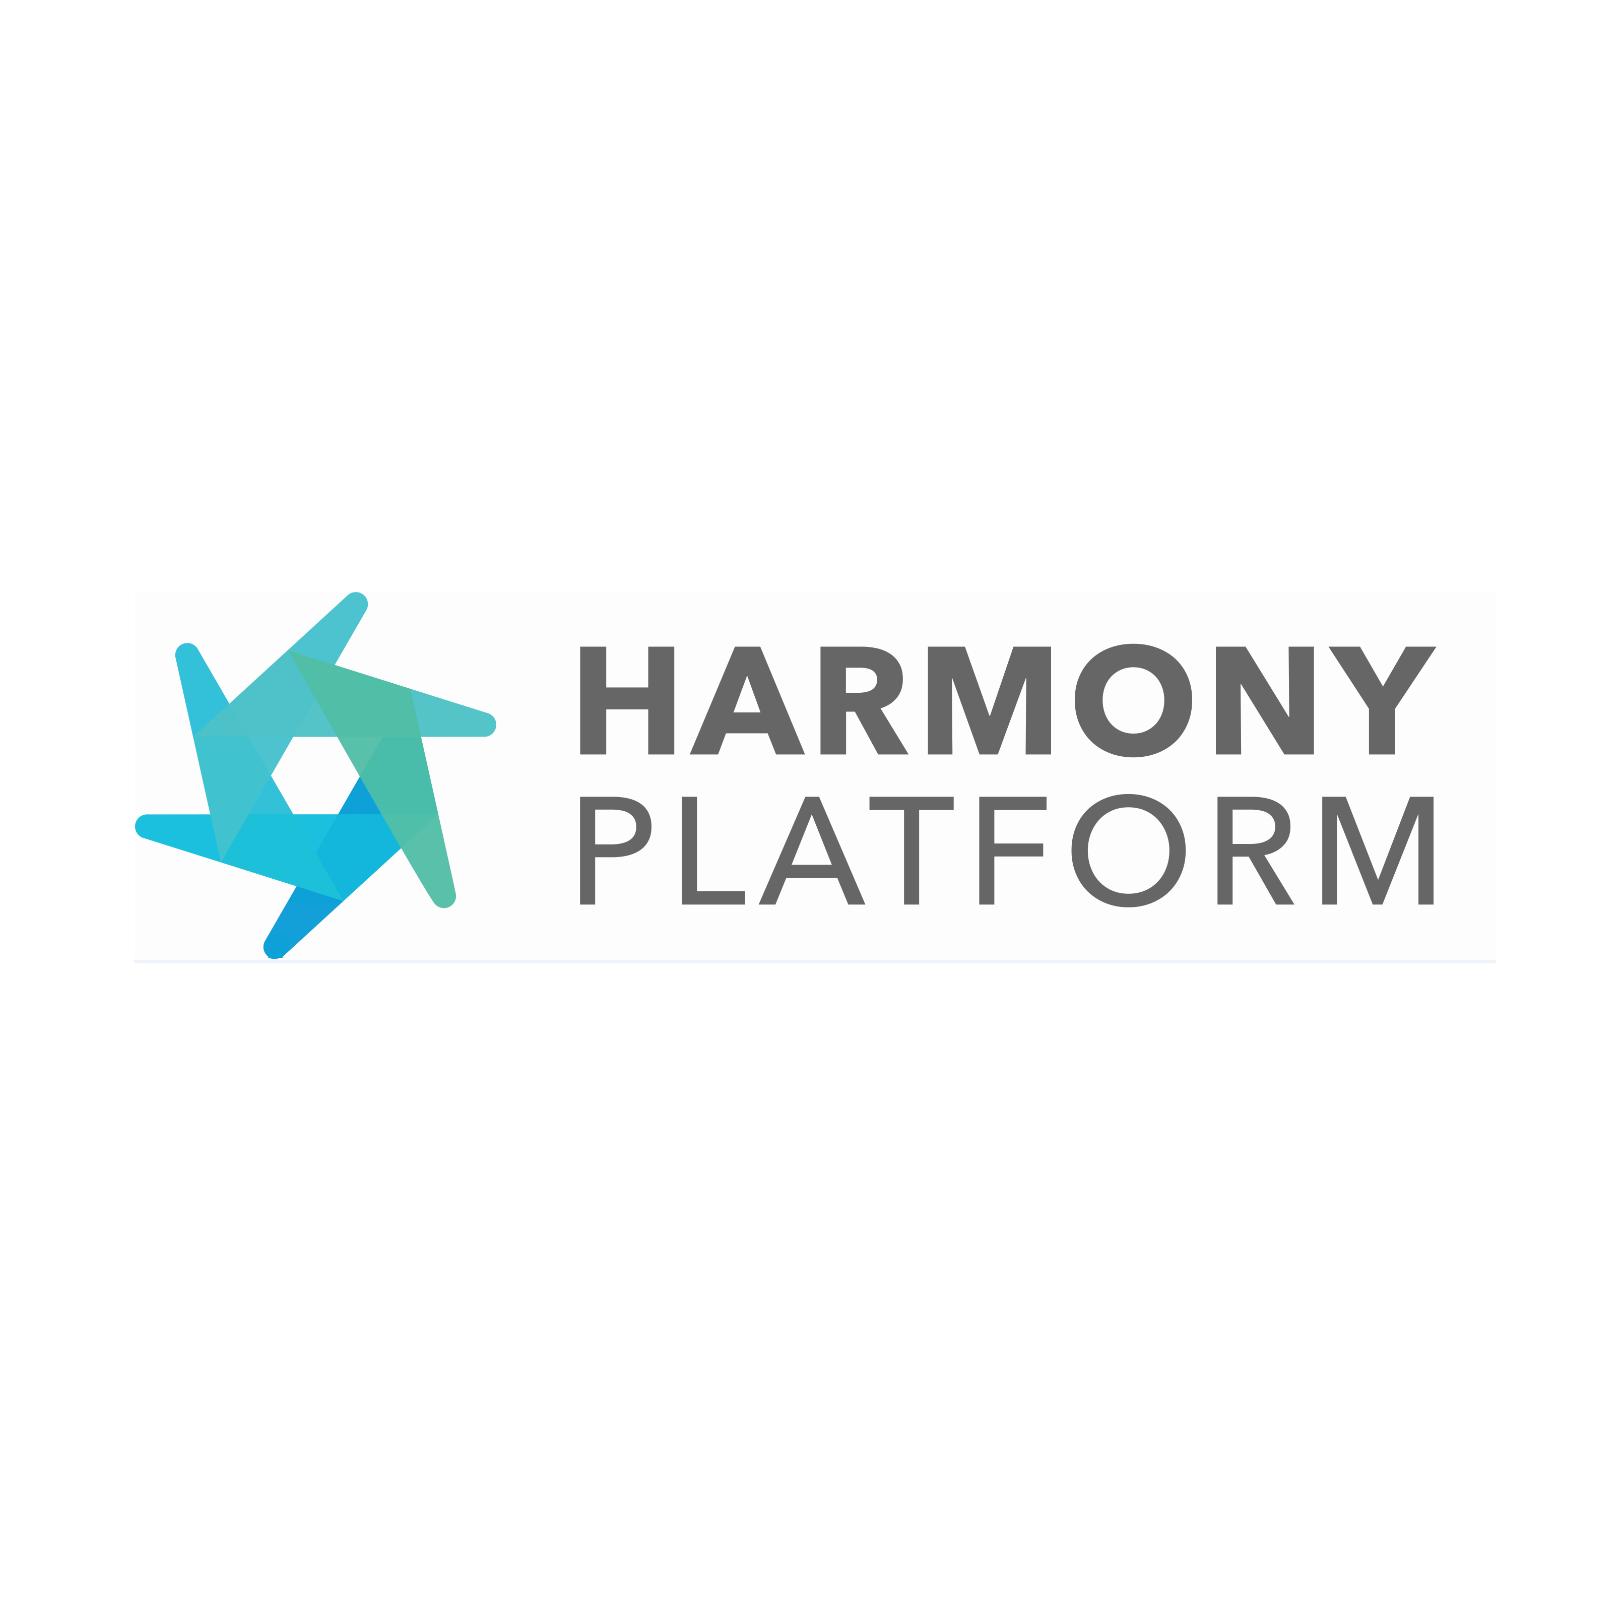 Harmony Platform Sq Logo.png